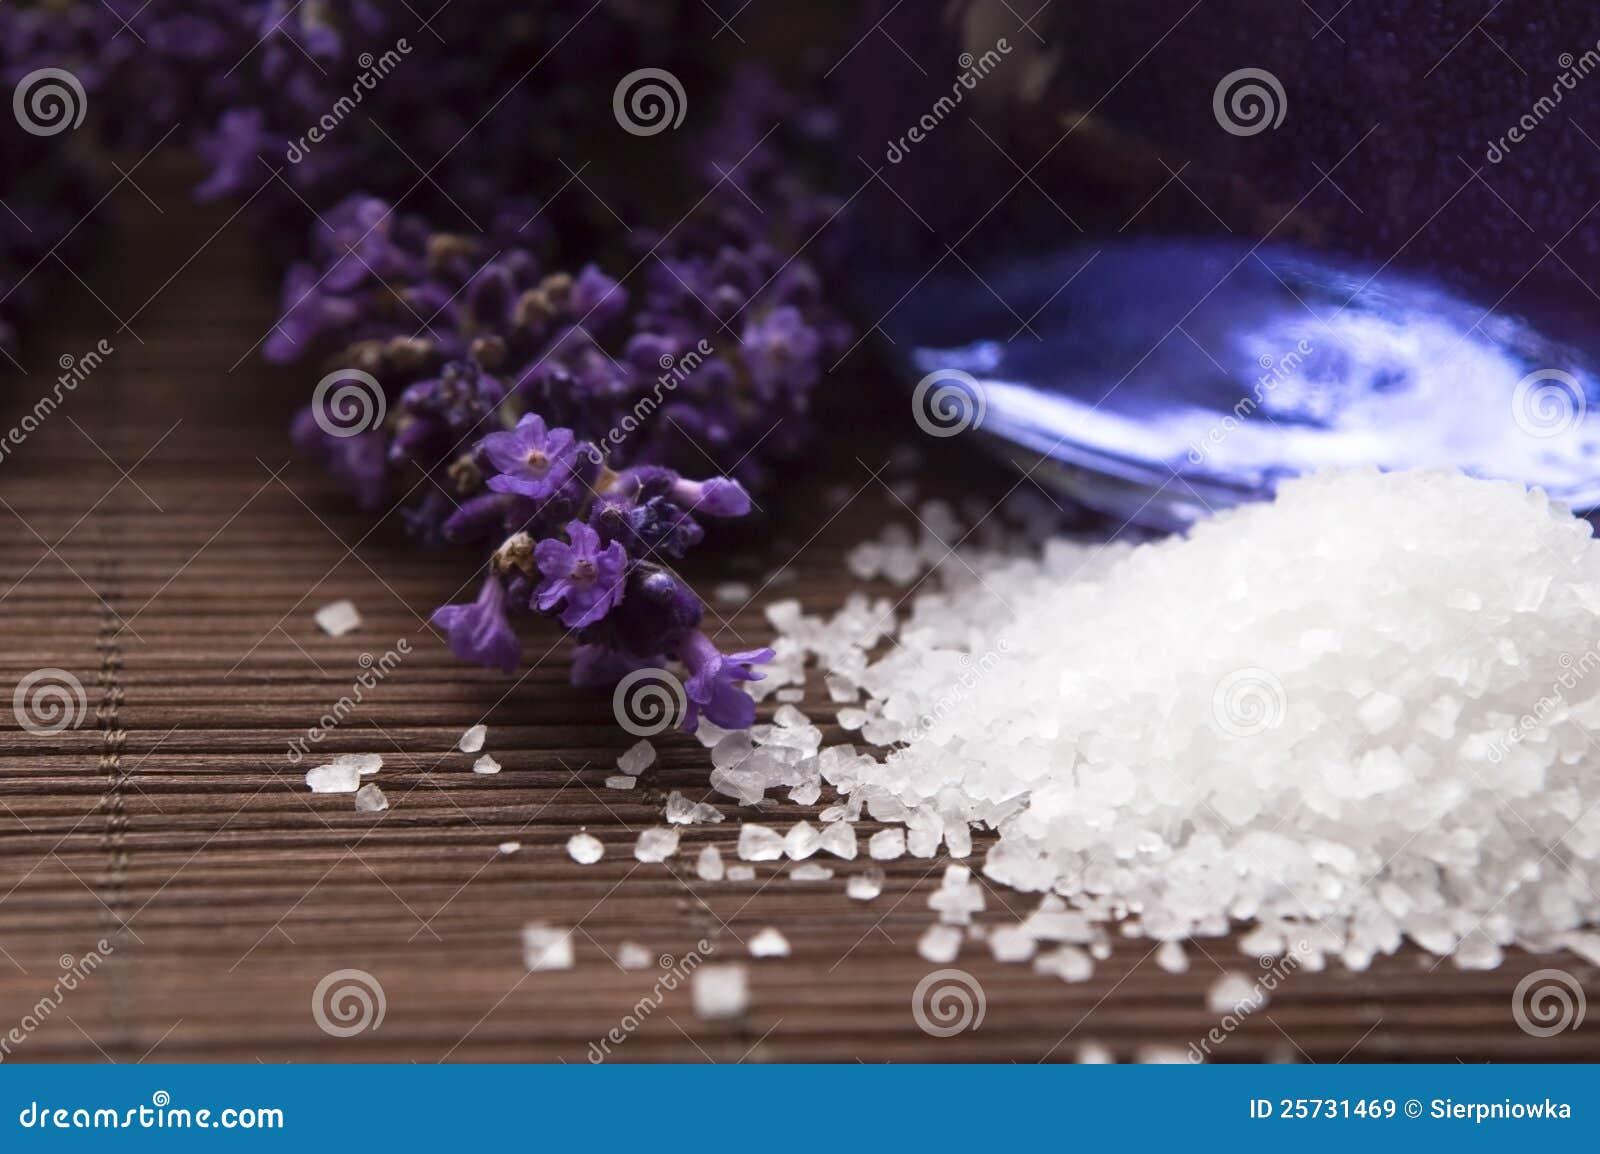 Lavender flowers, bath salt and essential oil